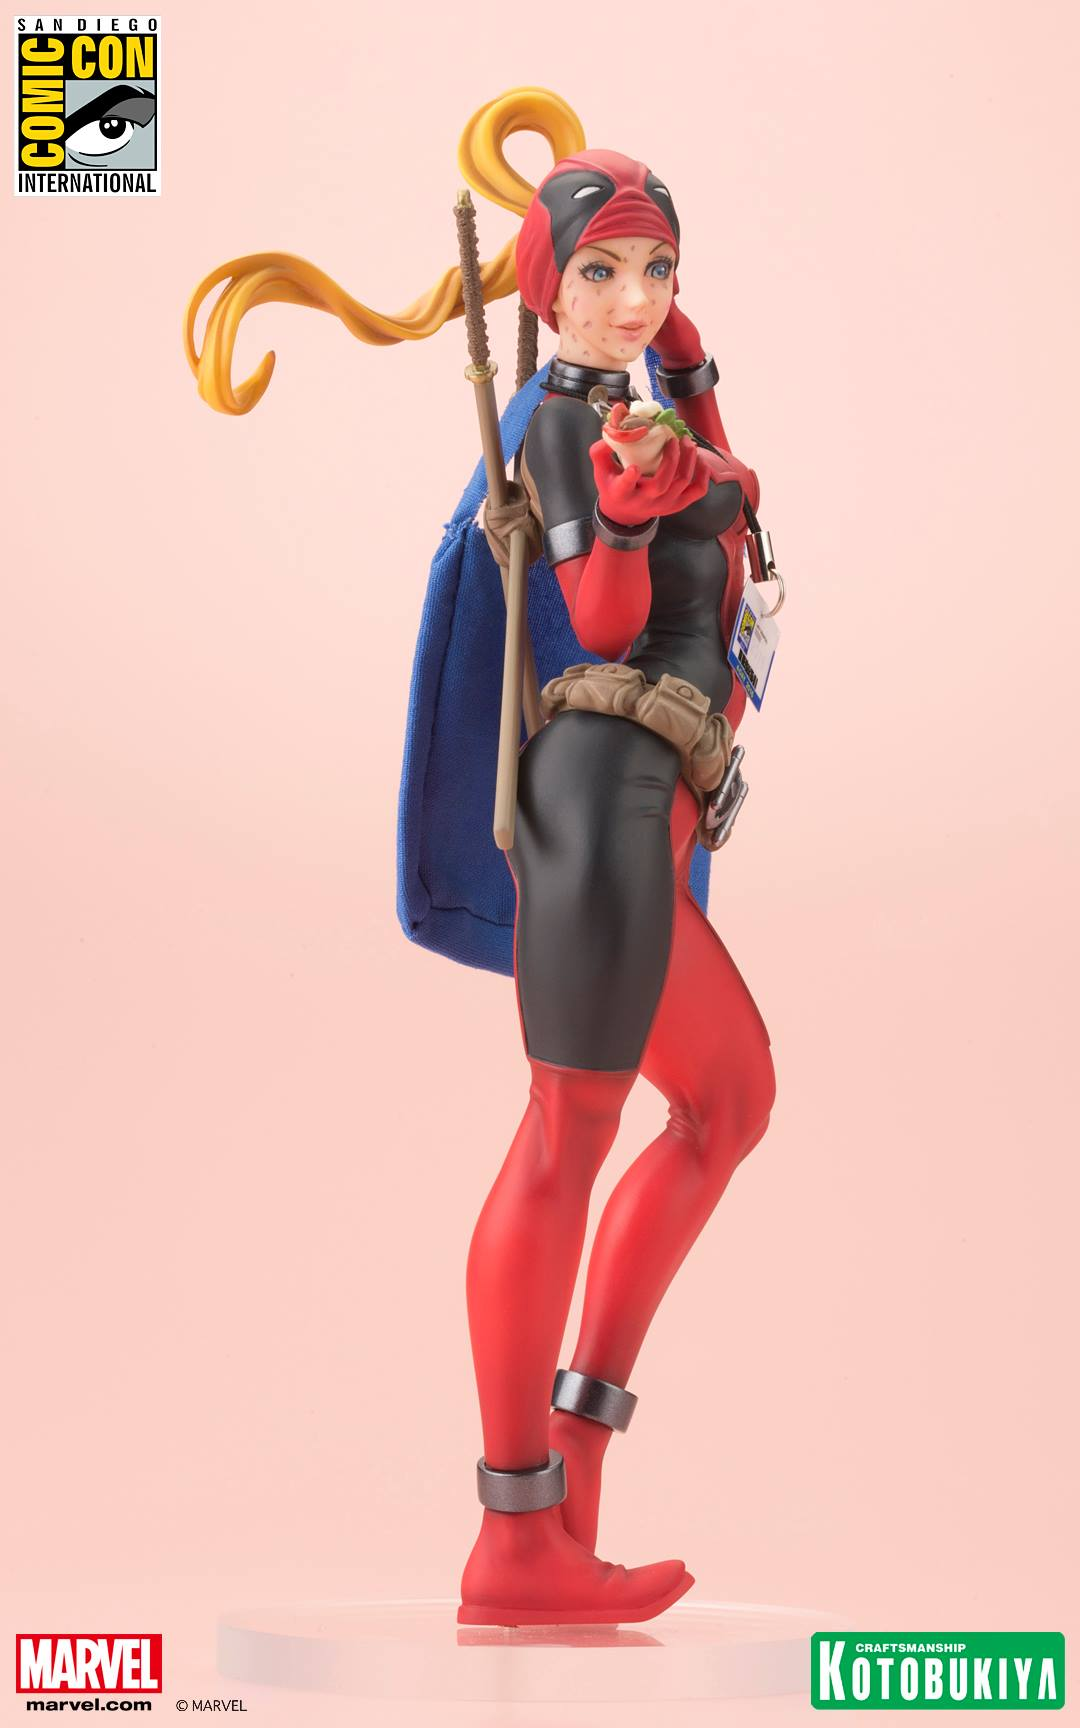 lady-deadpool-2016-sdcc-exclusive-bishoujo-statue-kotobukiya-marvel-3